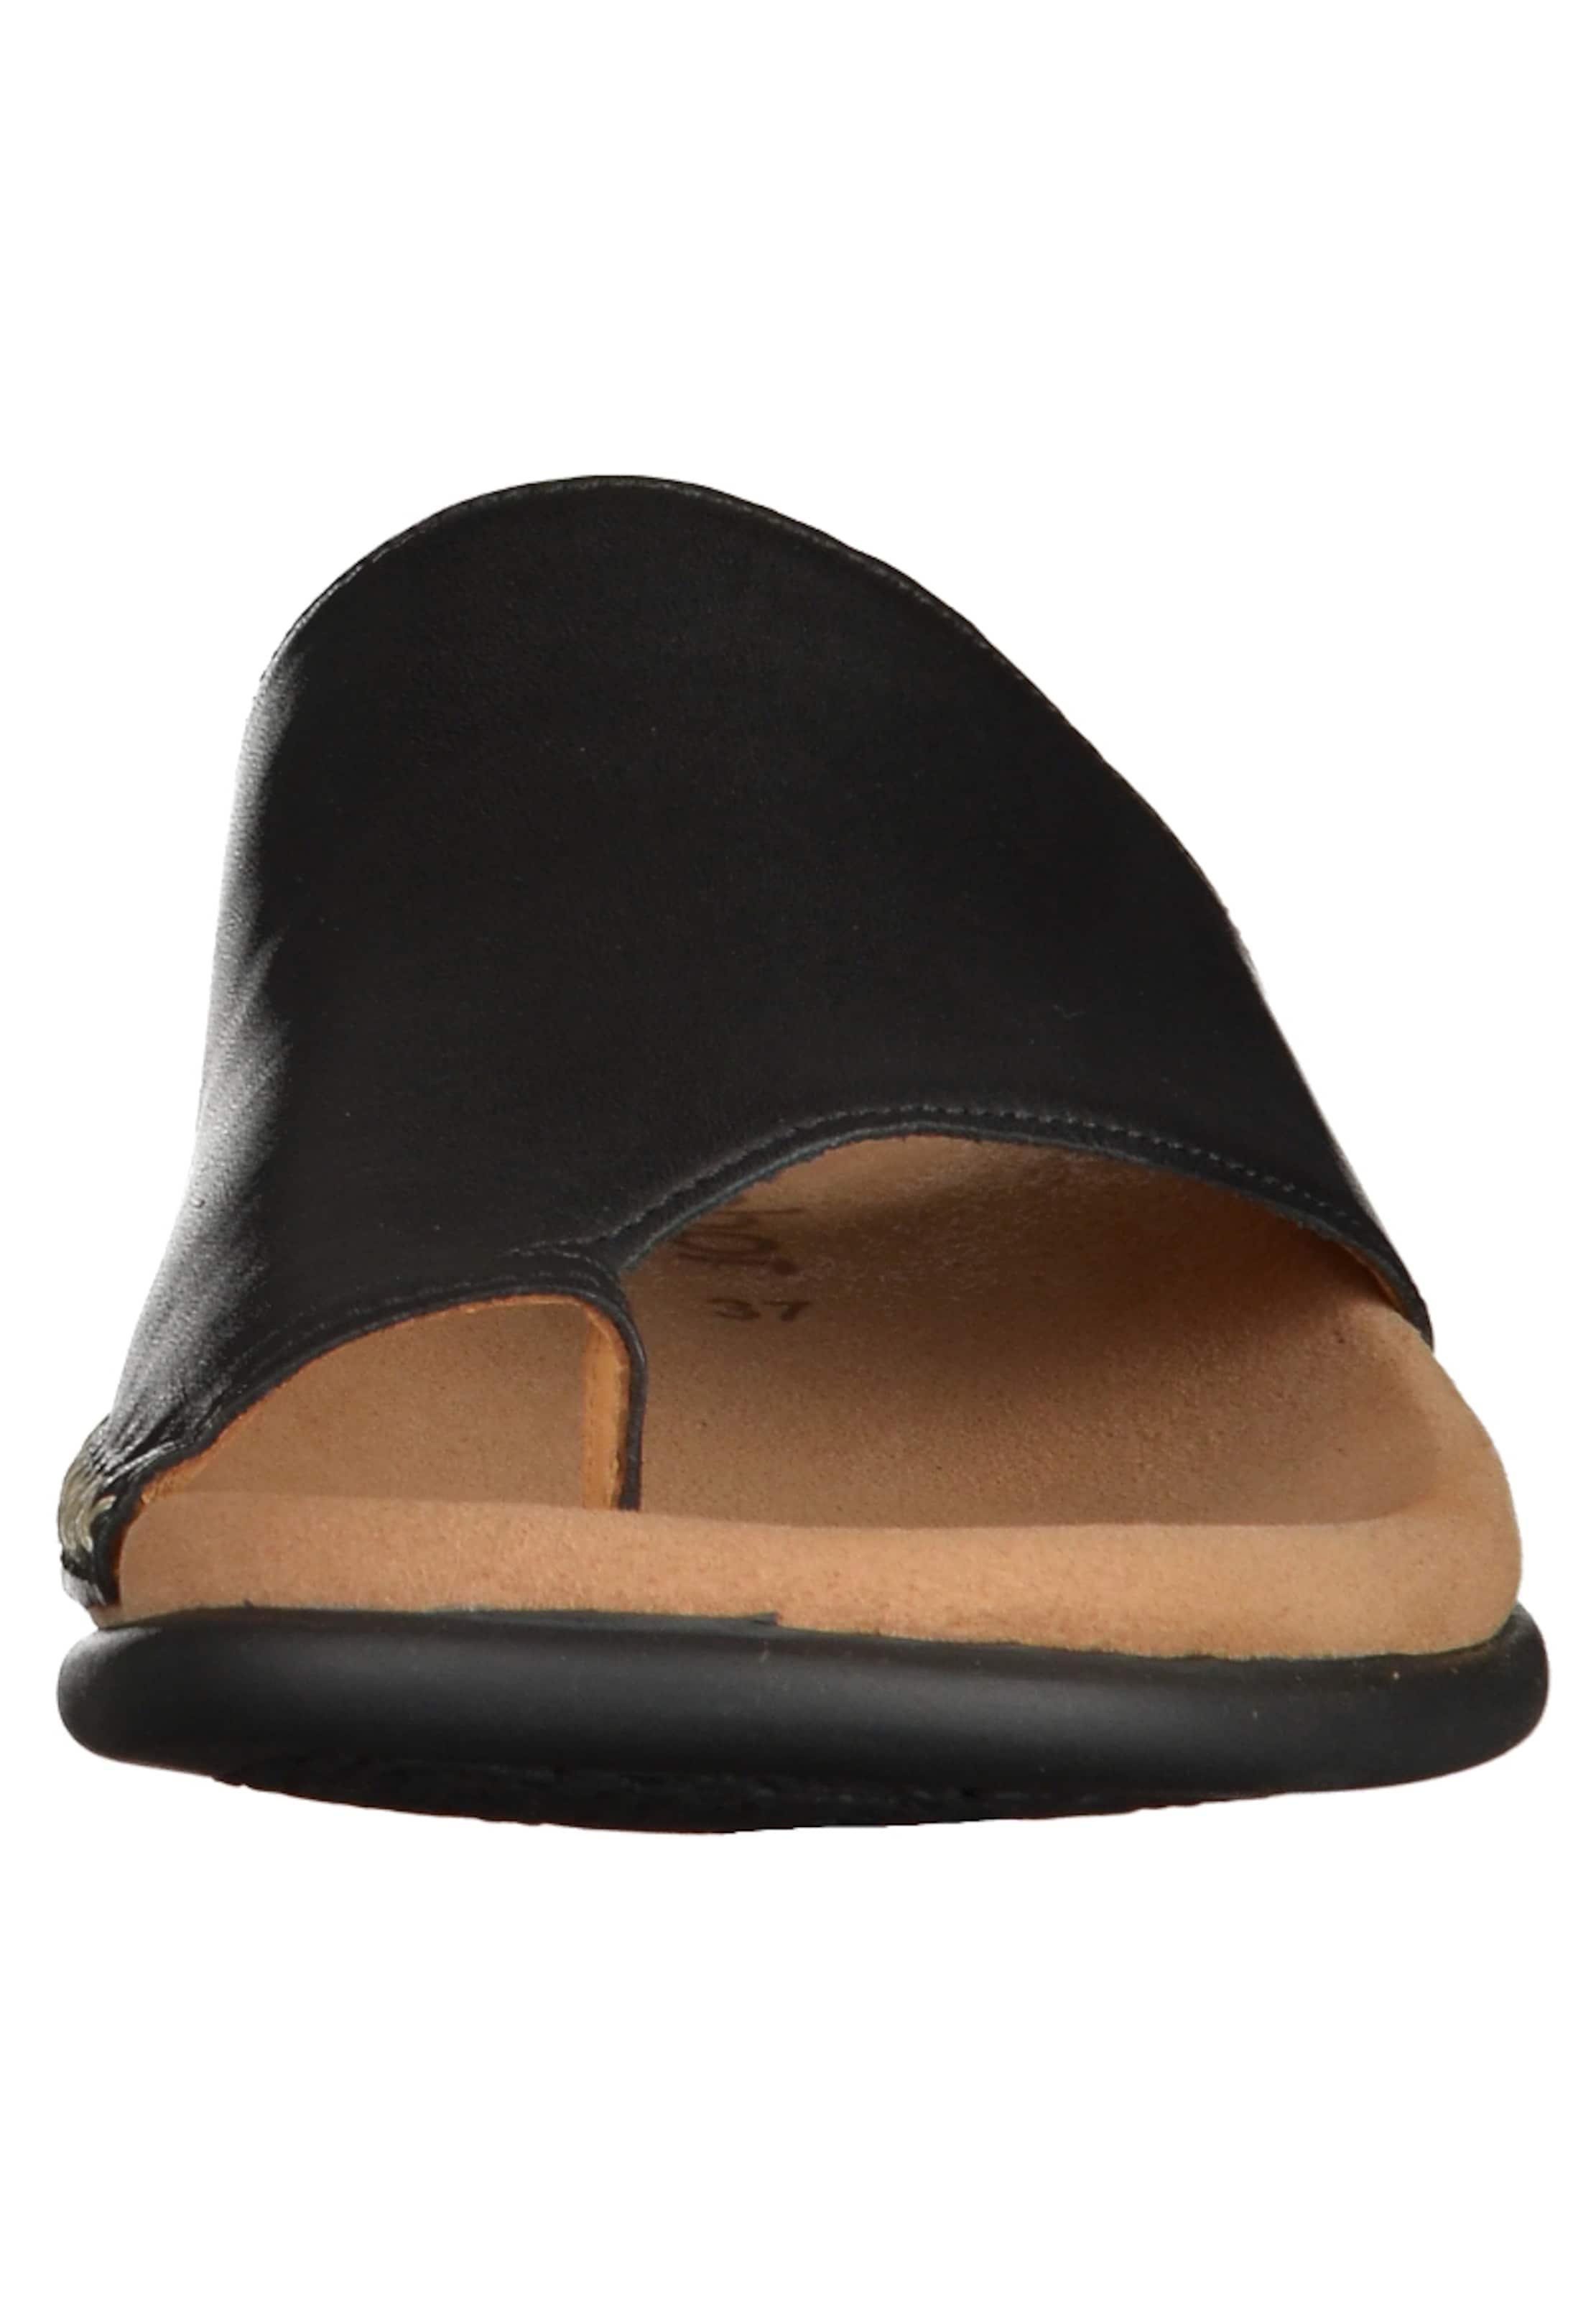 GABOR GABOR GABOR Sandale Leder Bequem, gut aussehend a05a58